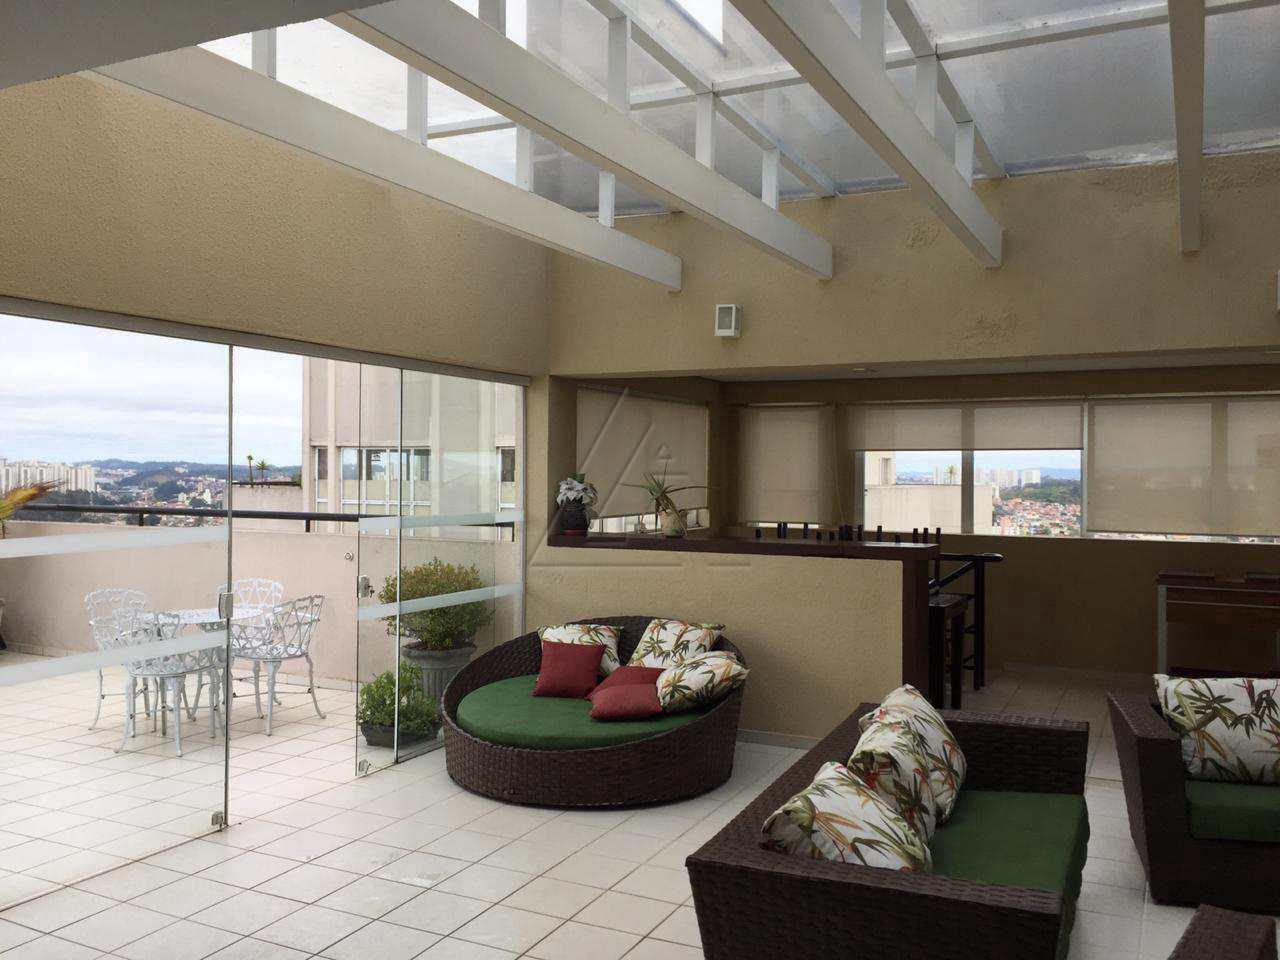 Cobertura com 3 dorms, Jardim Monte Kemel, São Paulo - R$ 1.2 mi, Cod: 3402